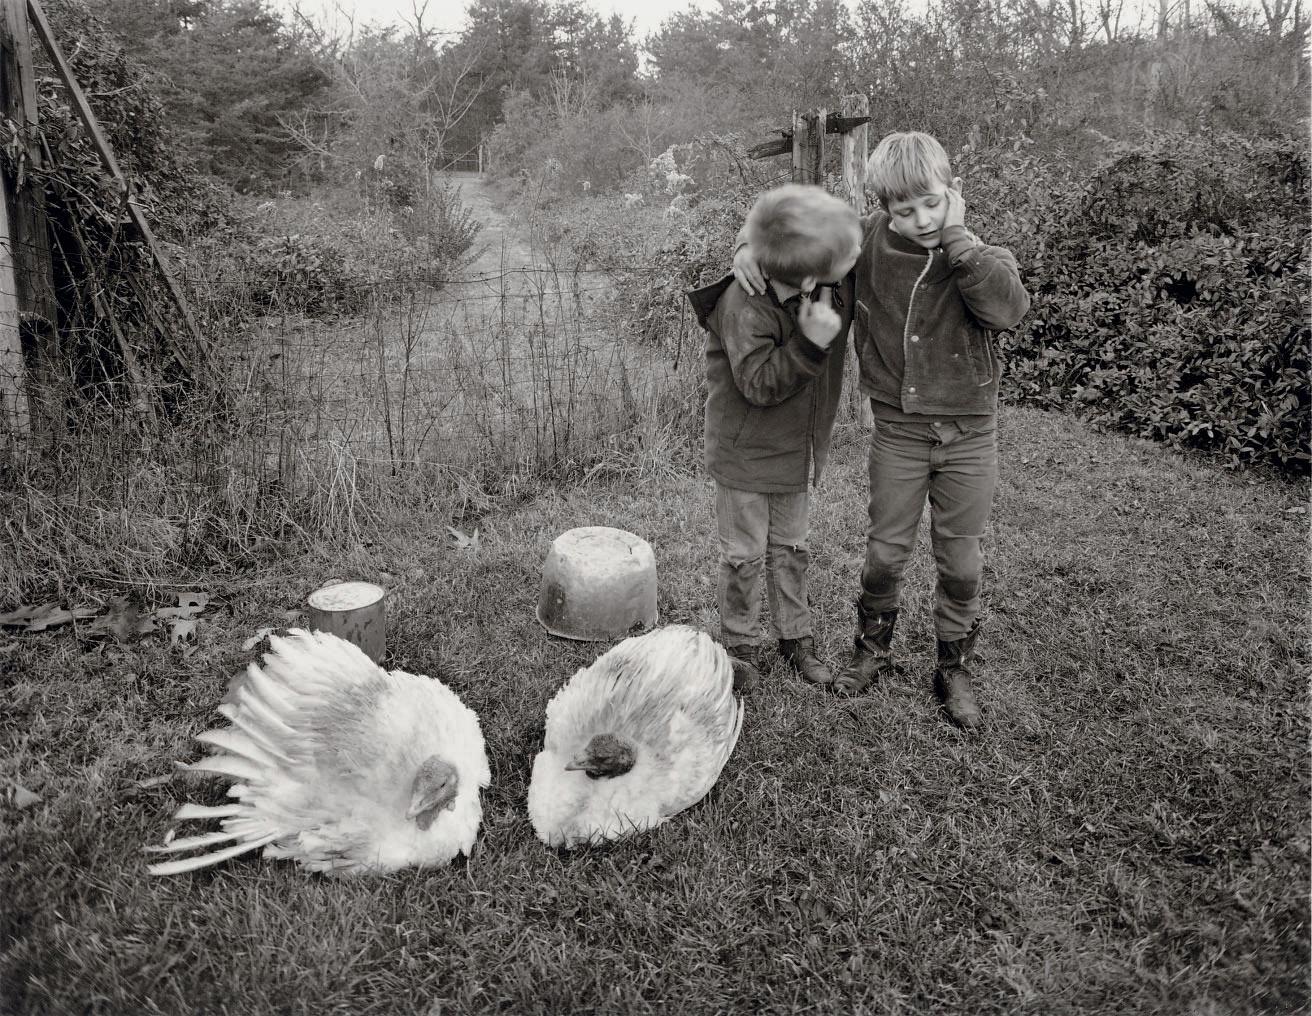 Barry, Dwayne and Turkeys, Danville, VA., 1970